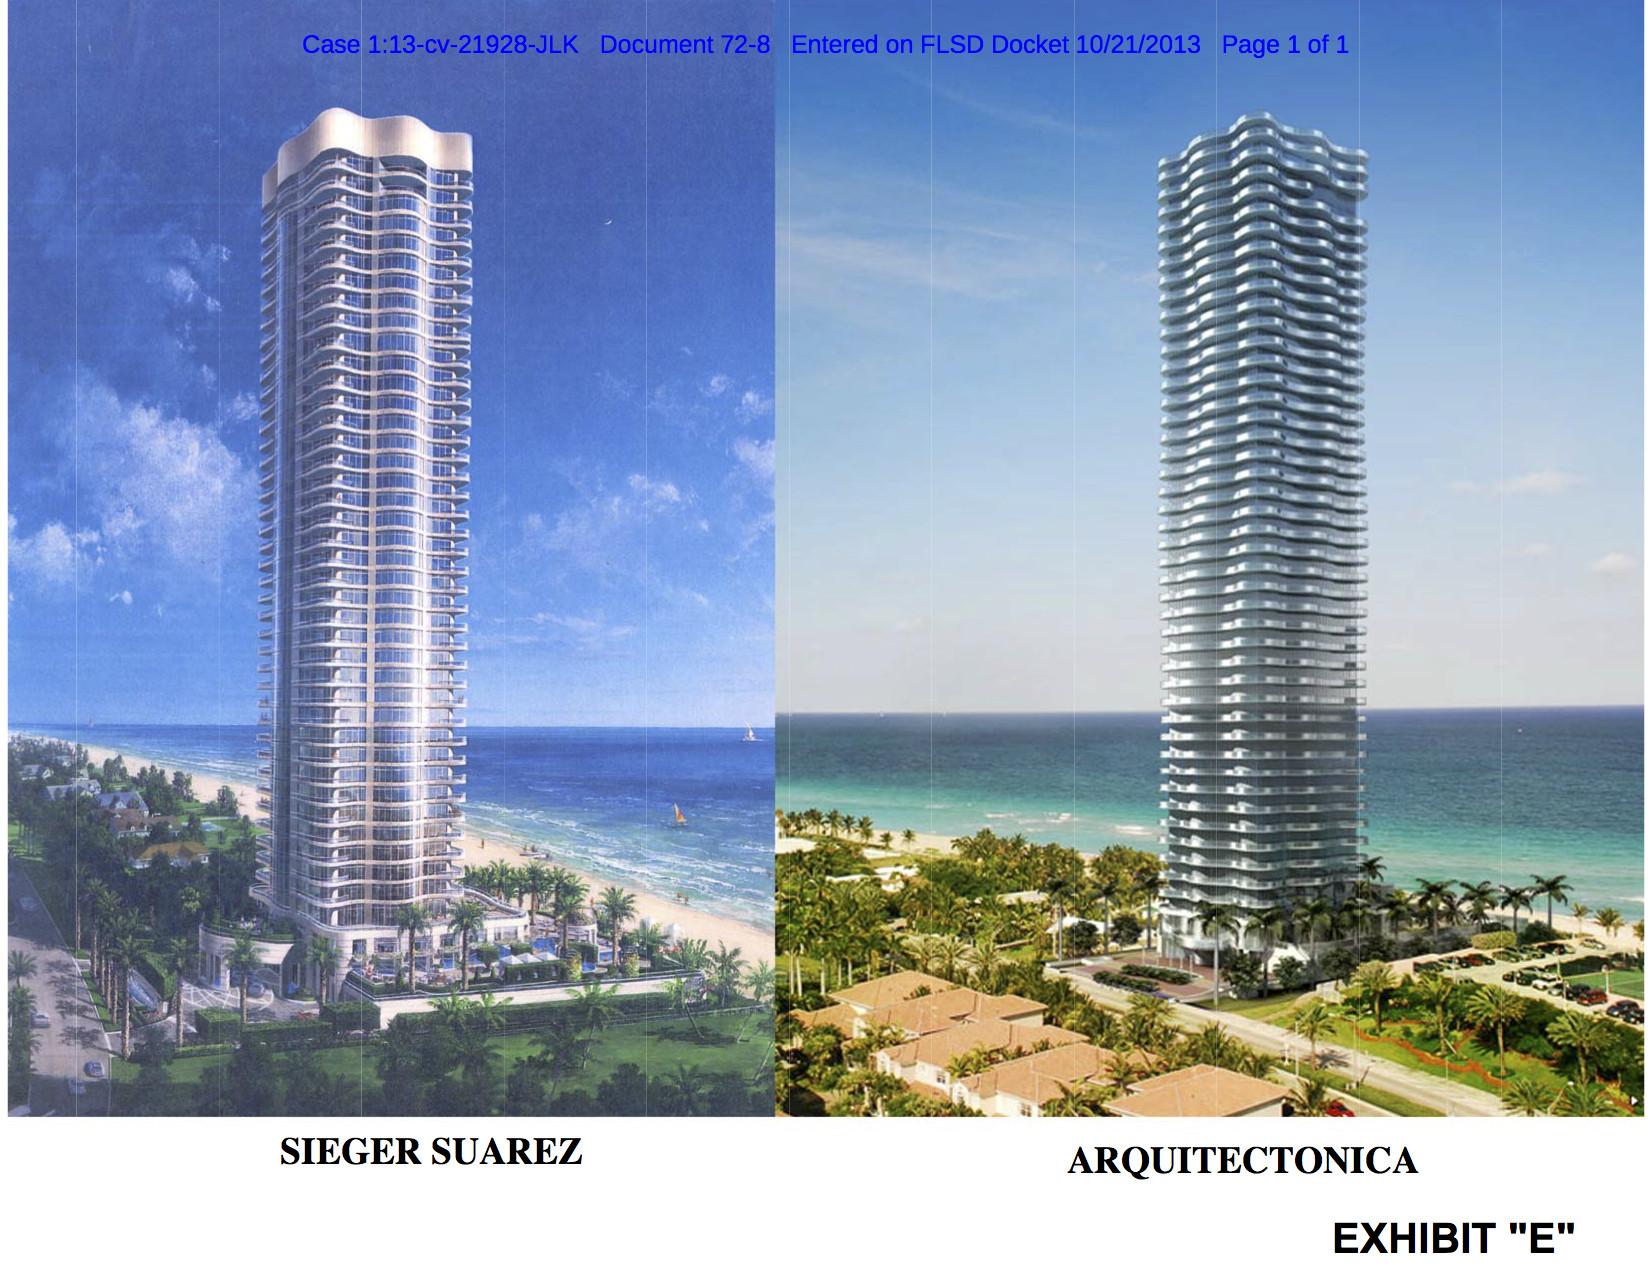 "Caso judicial de plagio ""Sieger Suarez Architectural Partnership v. Arquitectonica International Inc."". Image Cortesia de Mitch Tuchman"